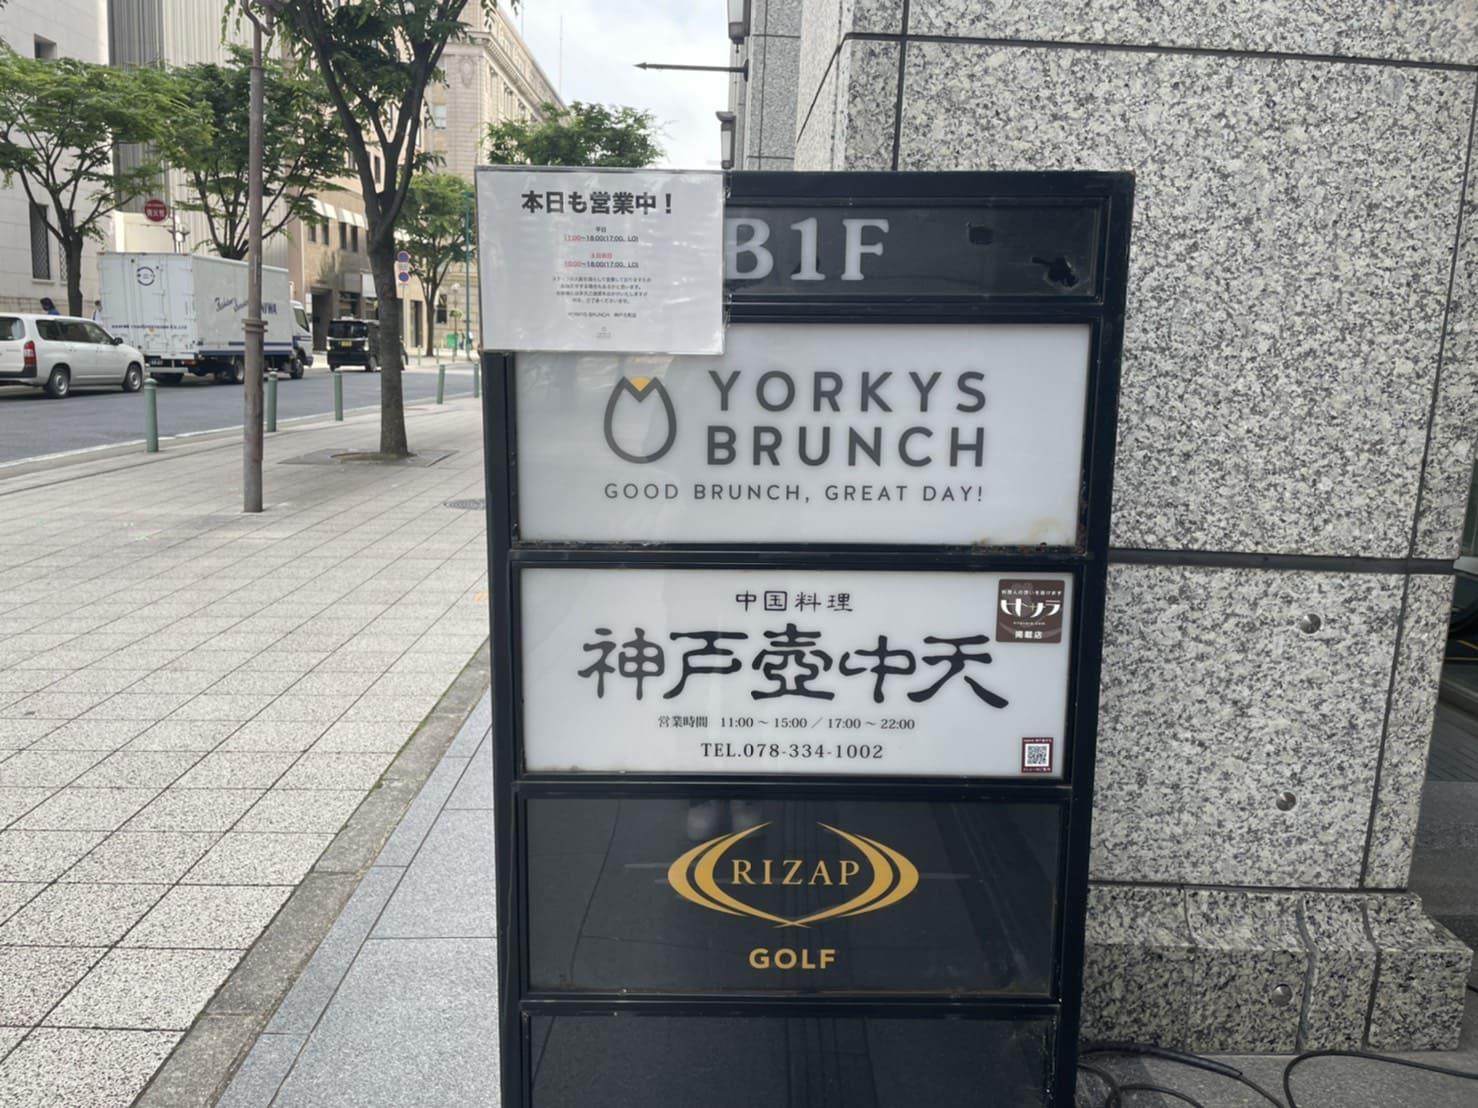 『YORKYS BRUNCH』の看板